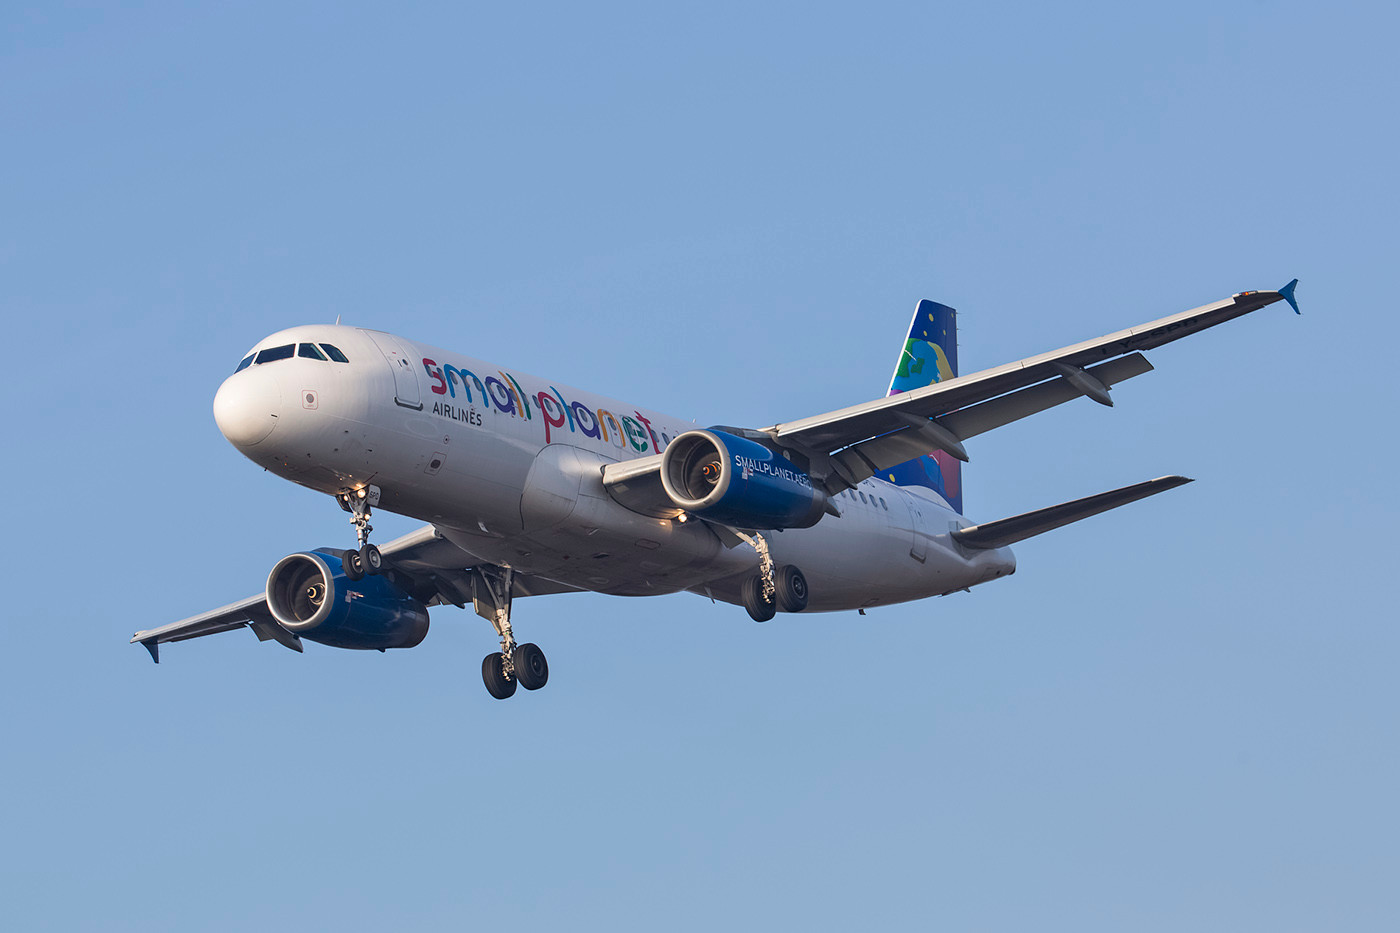 SPM 13.02.2015; LY-SPD, Airbus A 320-232, Small Planet (ex. Aero Lloyd, ex. Volare, ex. Niki, ex. LAN, ex. Jetstar)